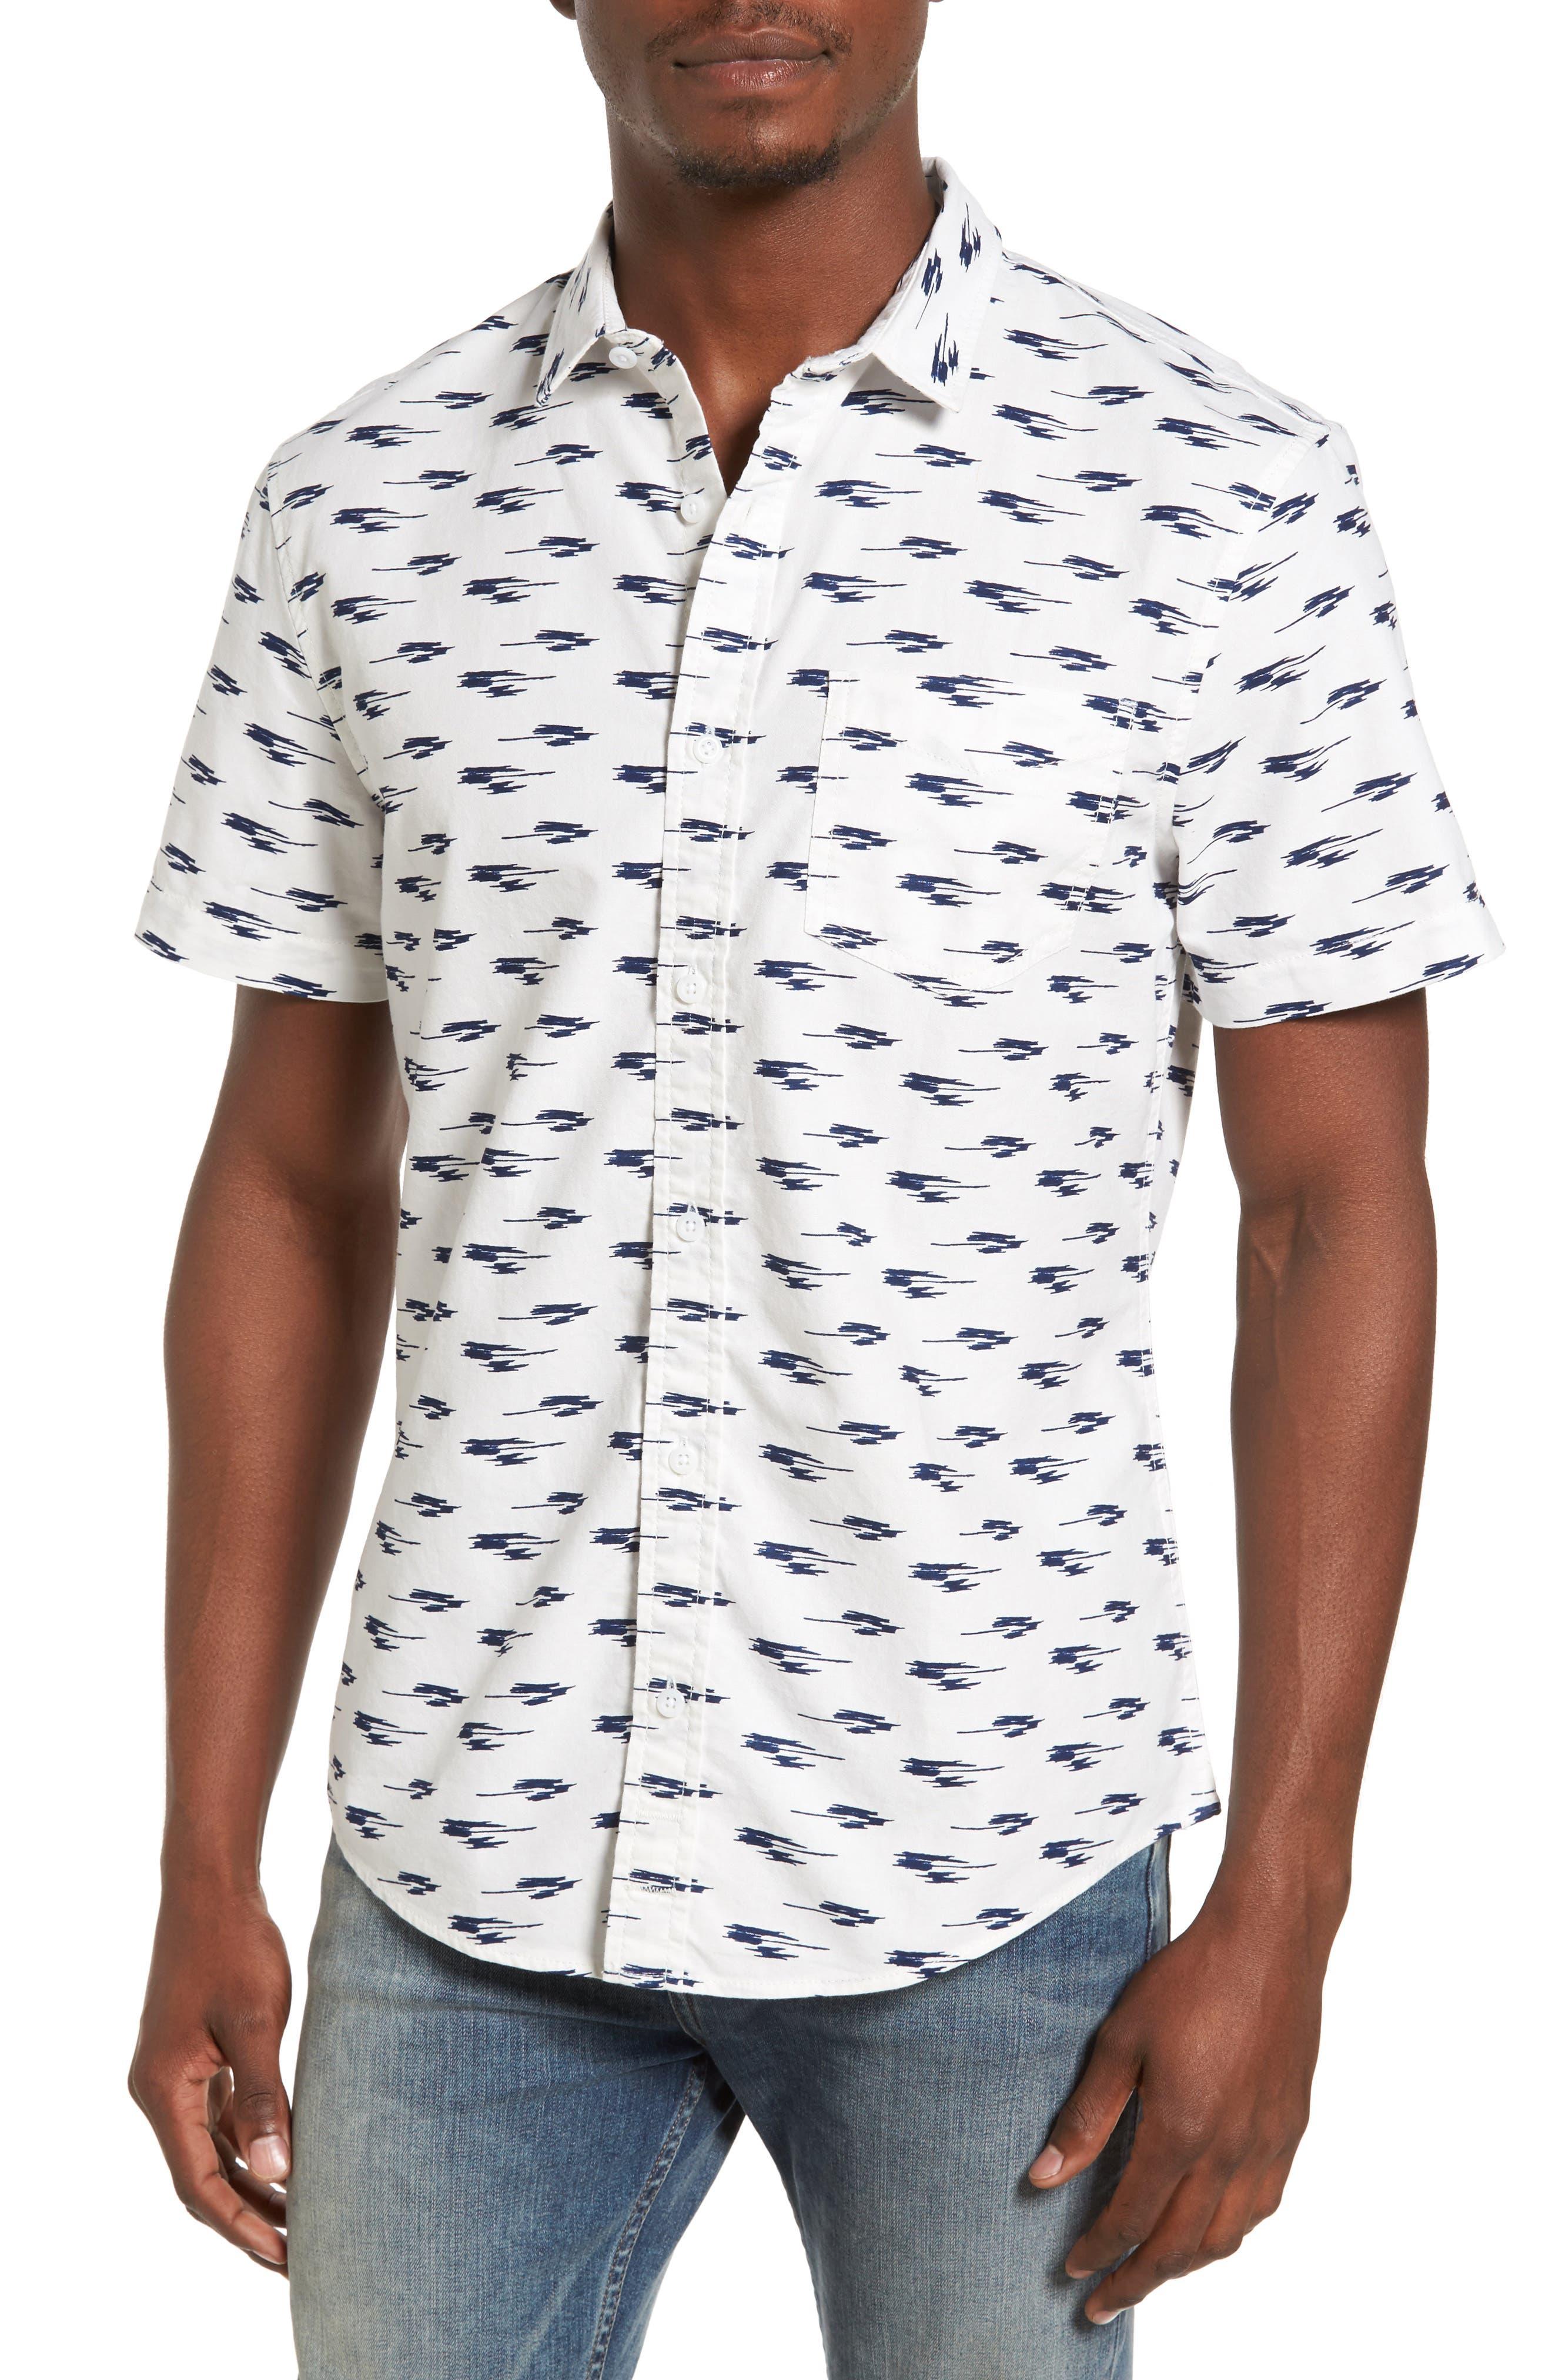 Alternate Image 1 Selected - 1901 Ikat Oxford Shirt